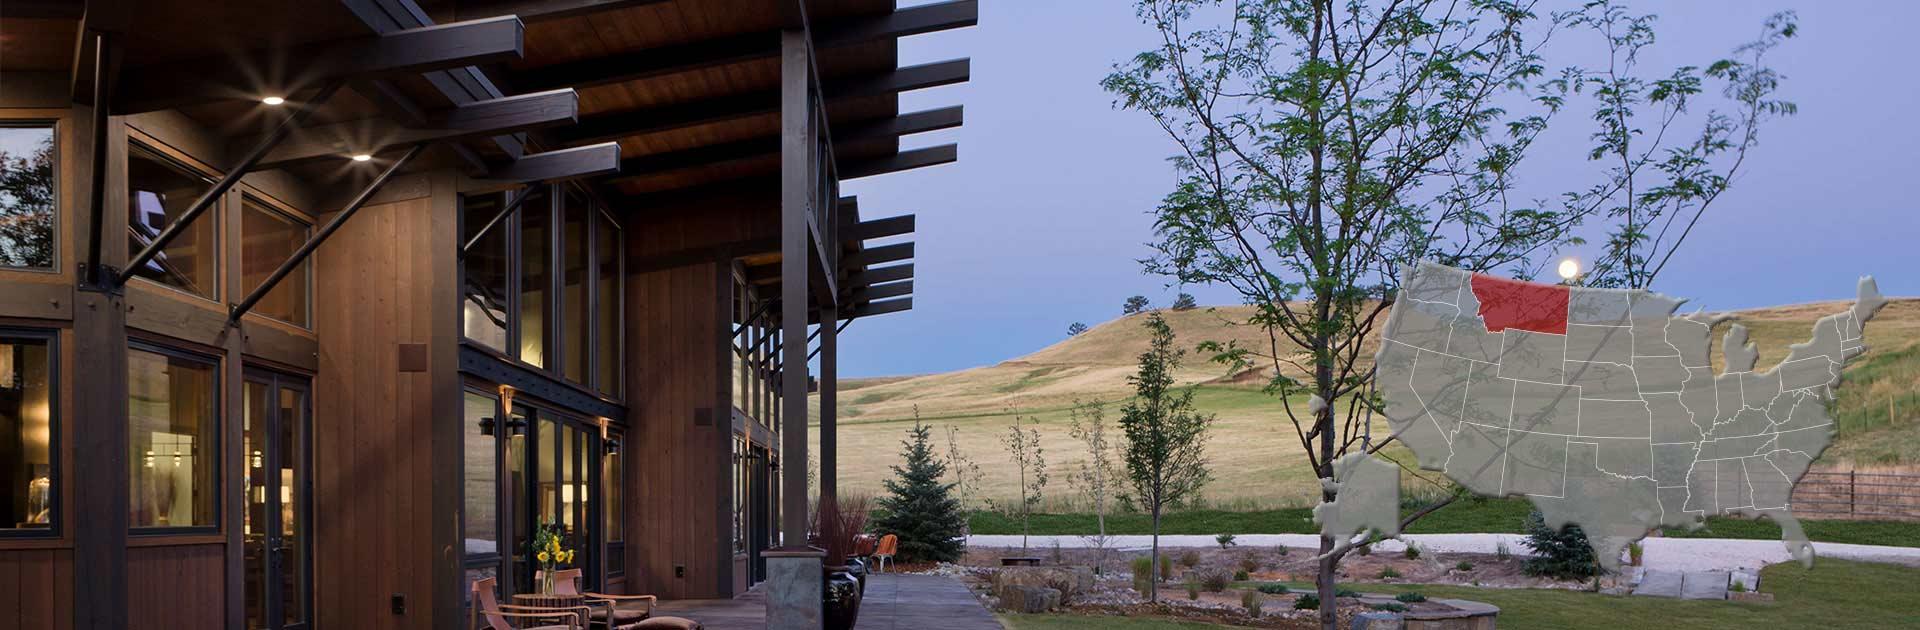 Build in Montana